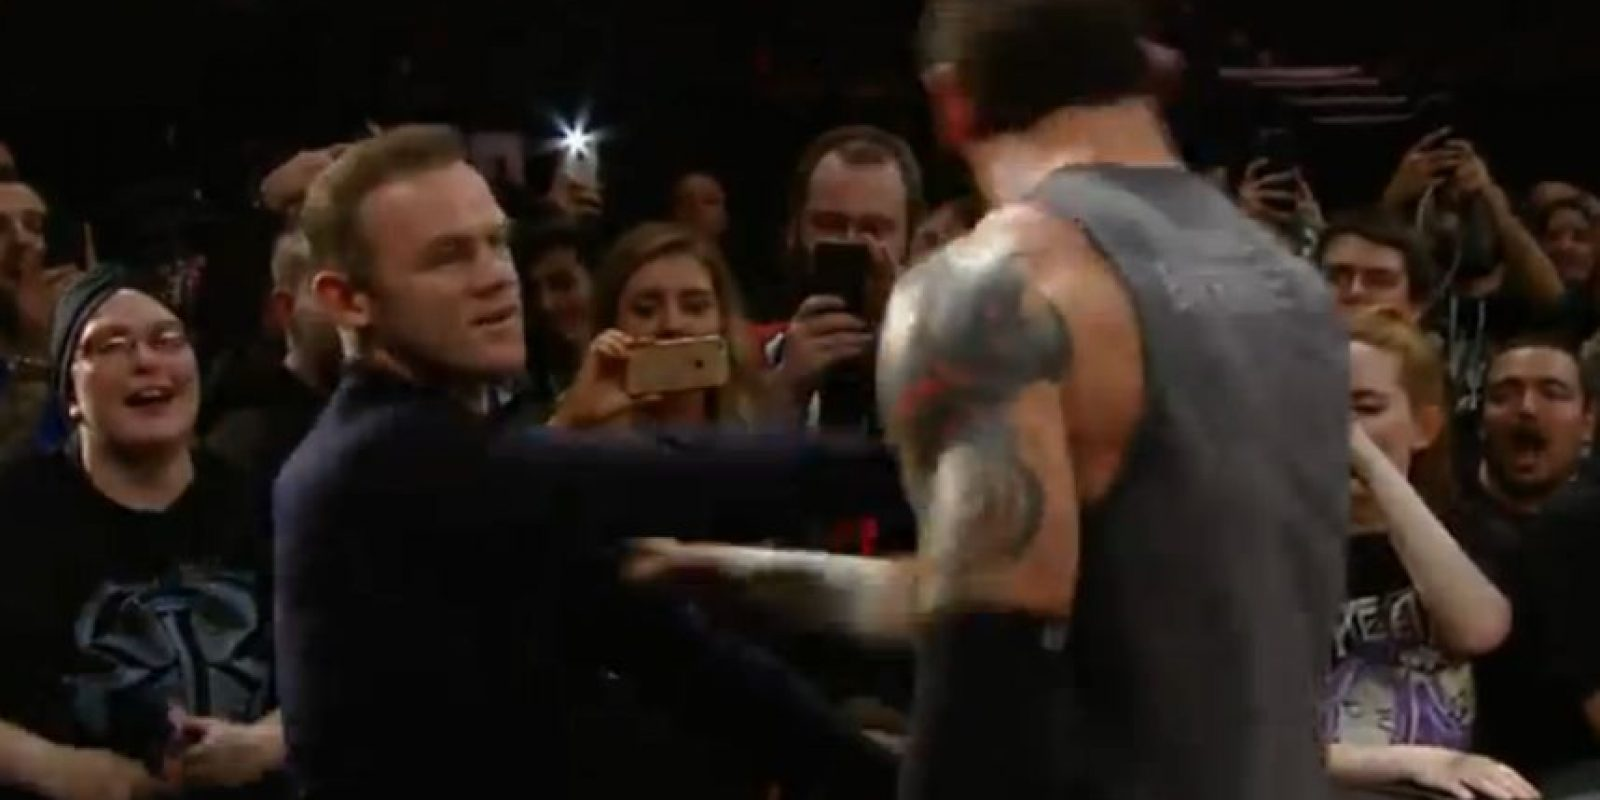 Cuando King Barrett, luchador originario de la Gran Bretaña, apareció en el ring, comenzó a provocar al futbolista del Manchester United. Foto:WWE